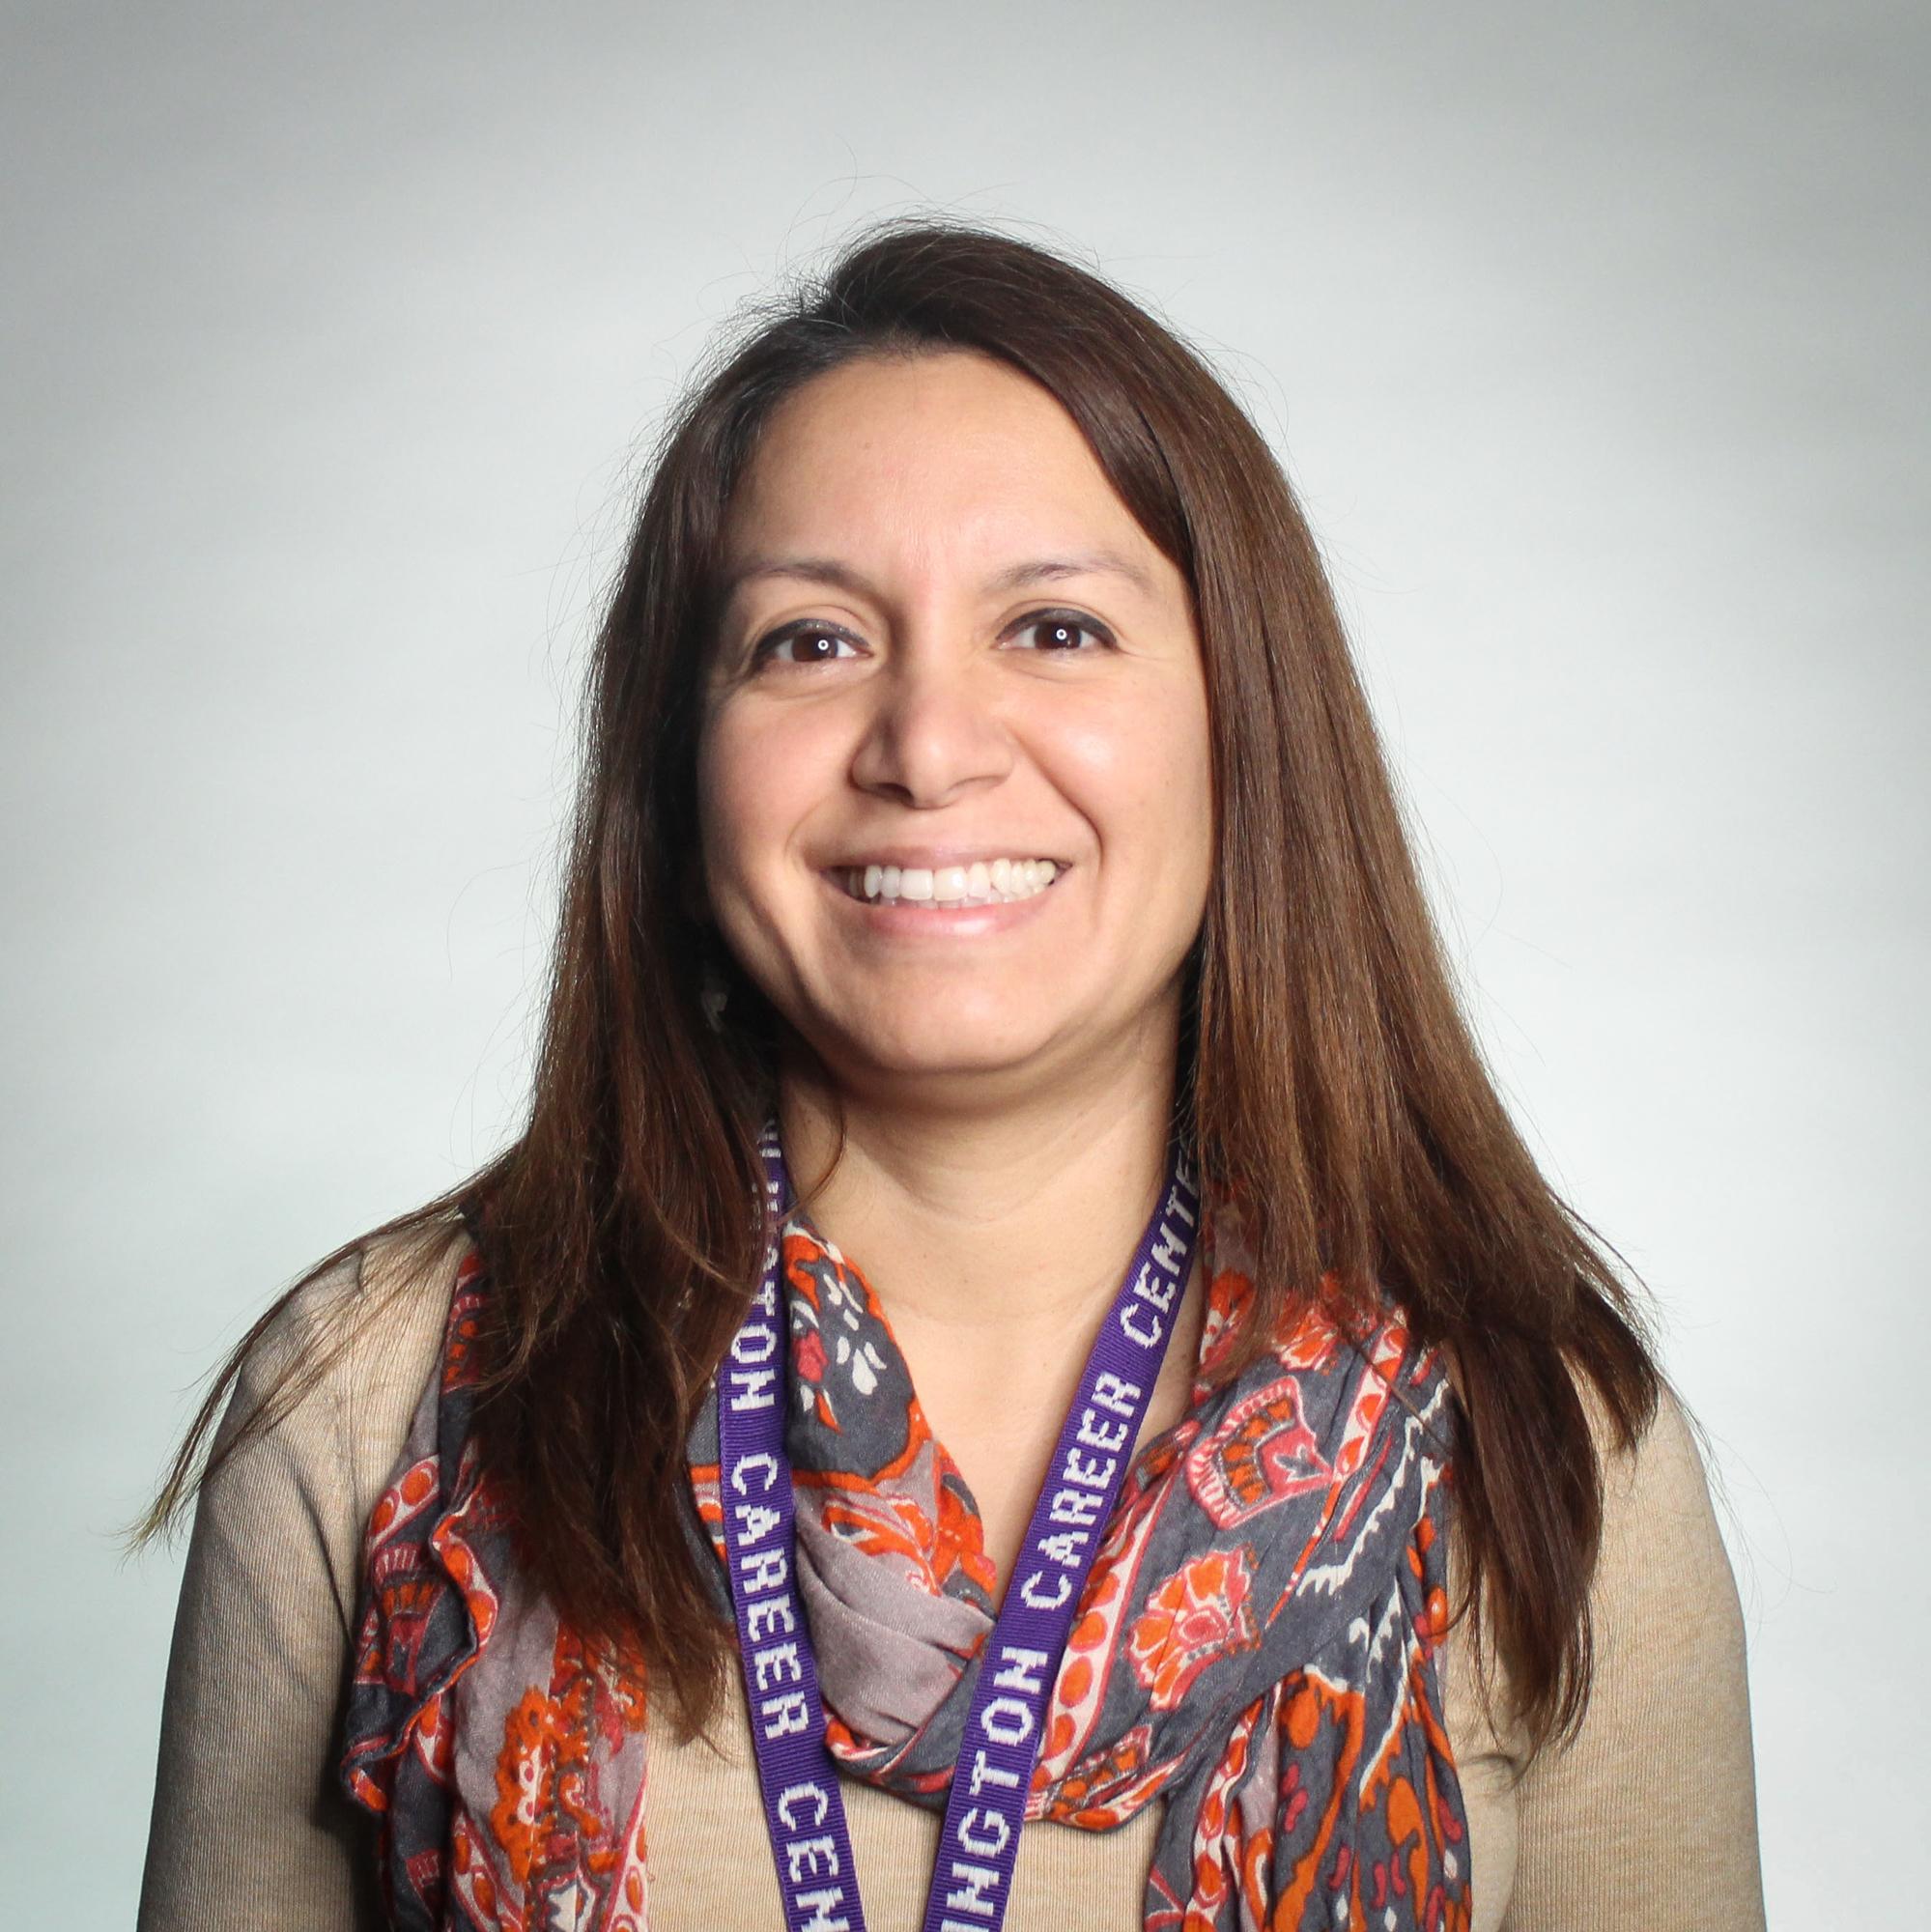 Ms. Vanessa Zuniga